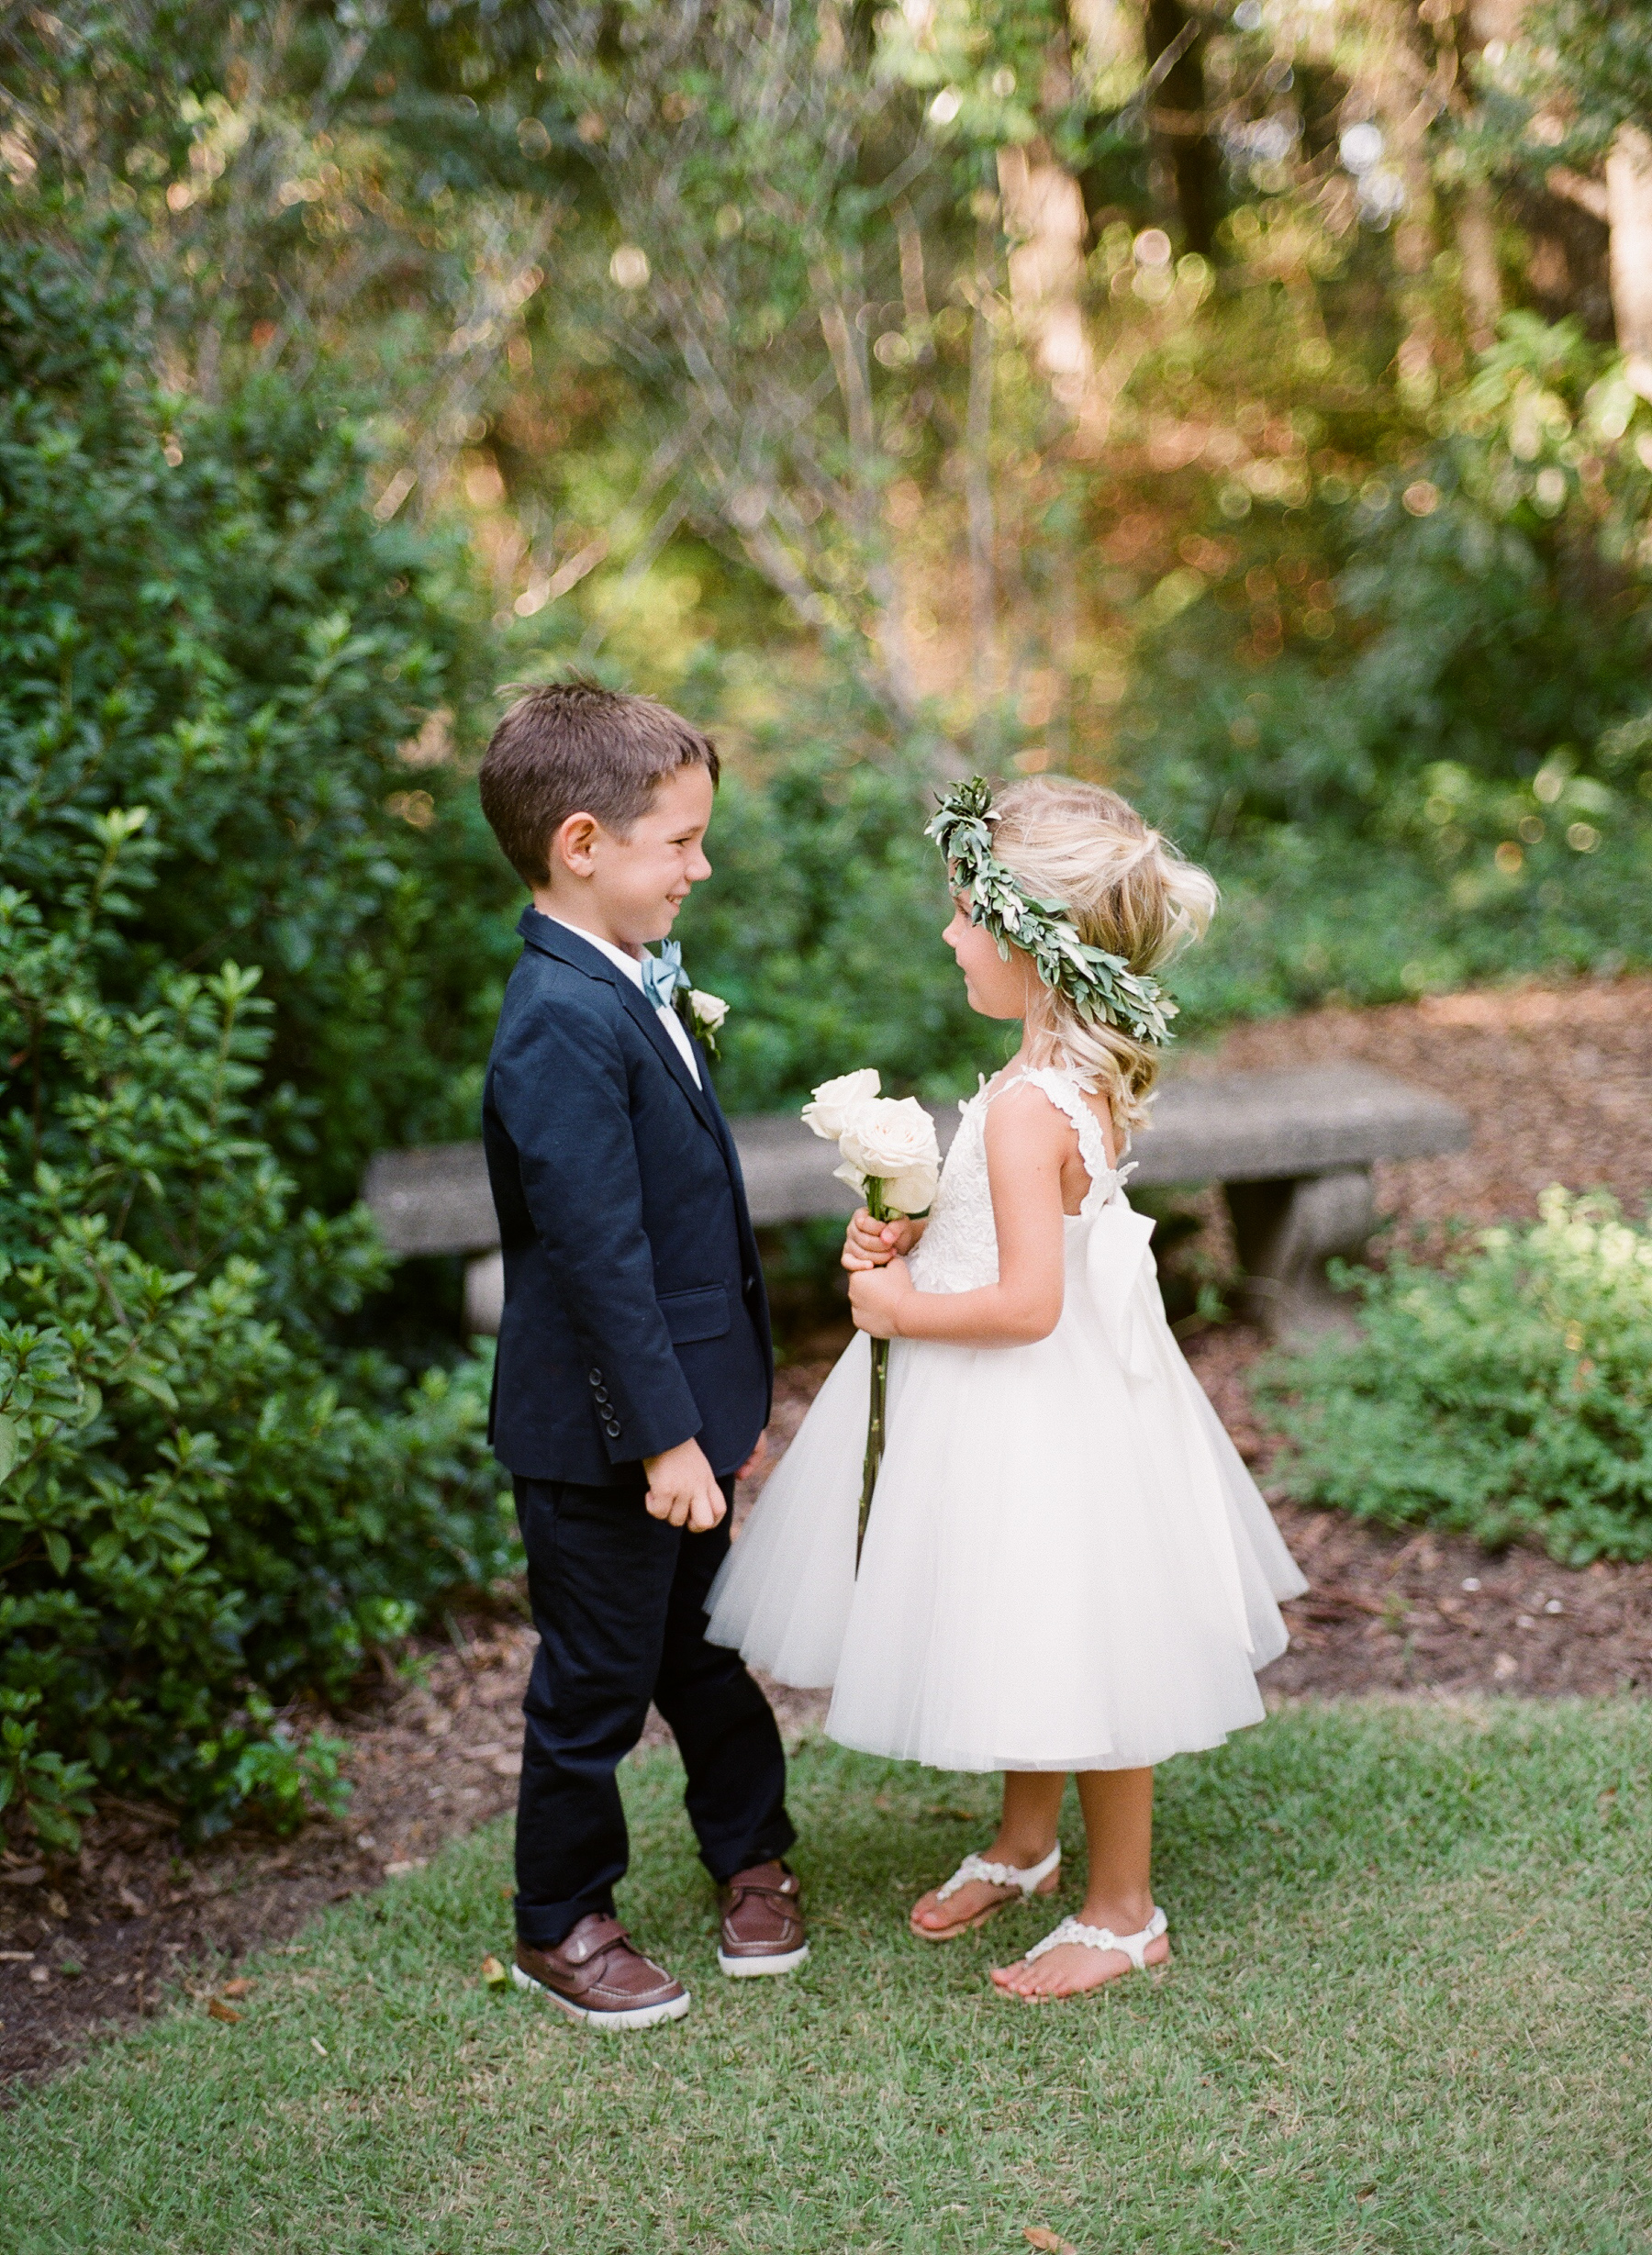 Airlie Gardens Wedding 39.jpg